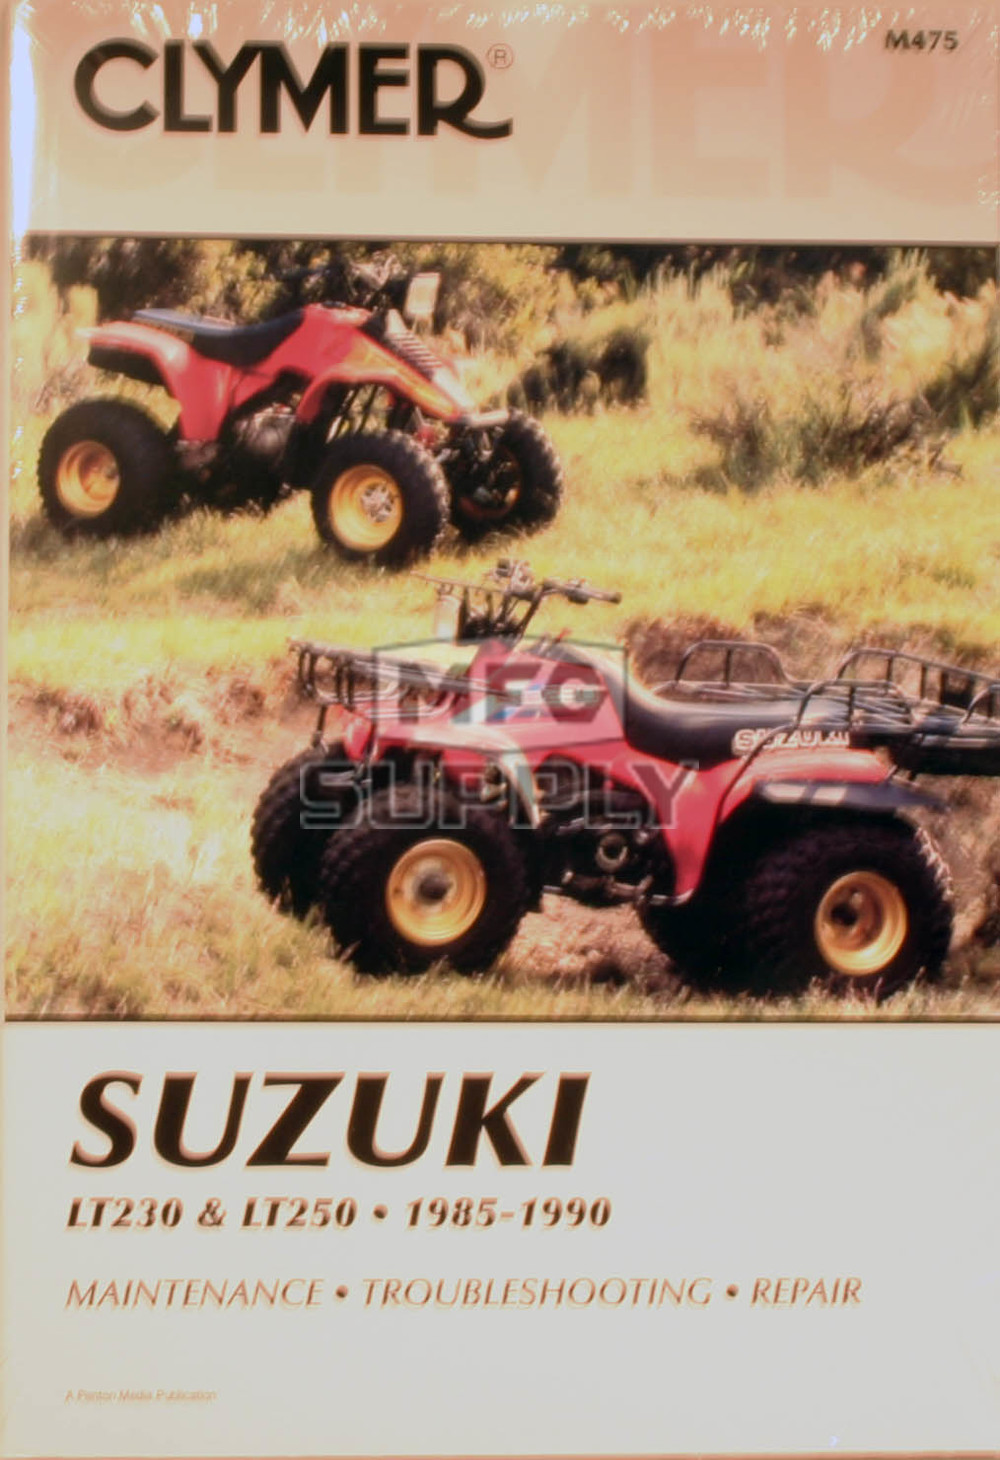 1987 Suzuki Lt230 Wiring Diagram from www.mfgsupply.com